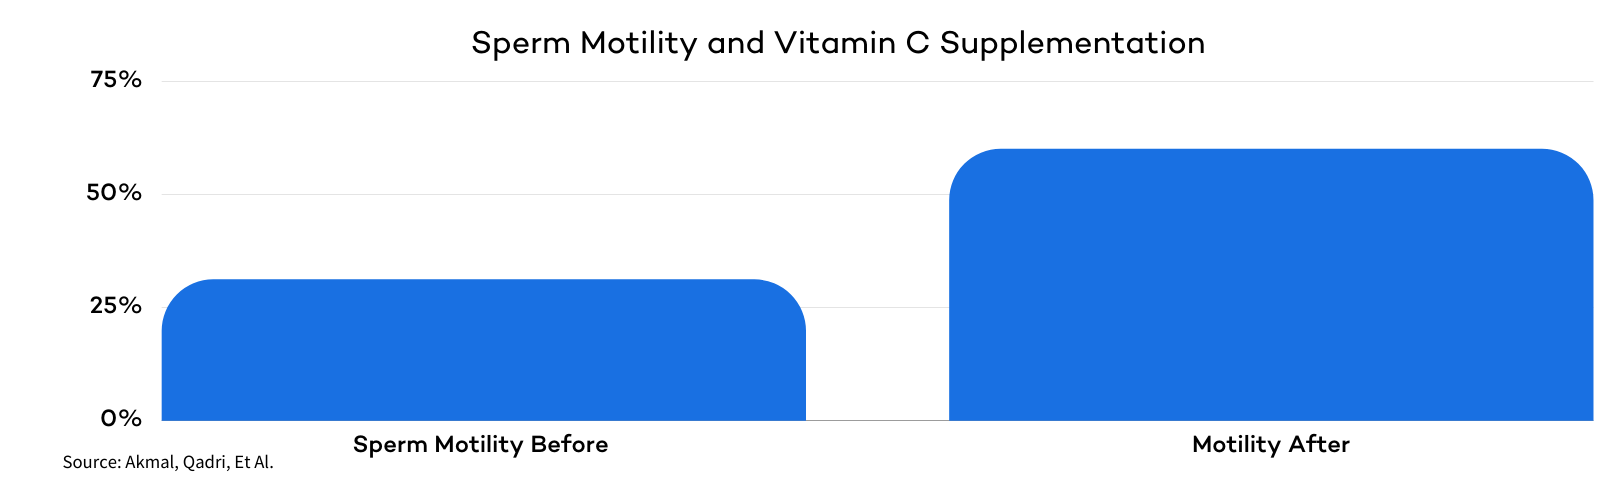 Vitamin C and Sperm Motility